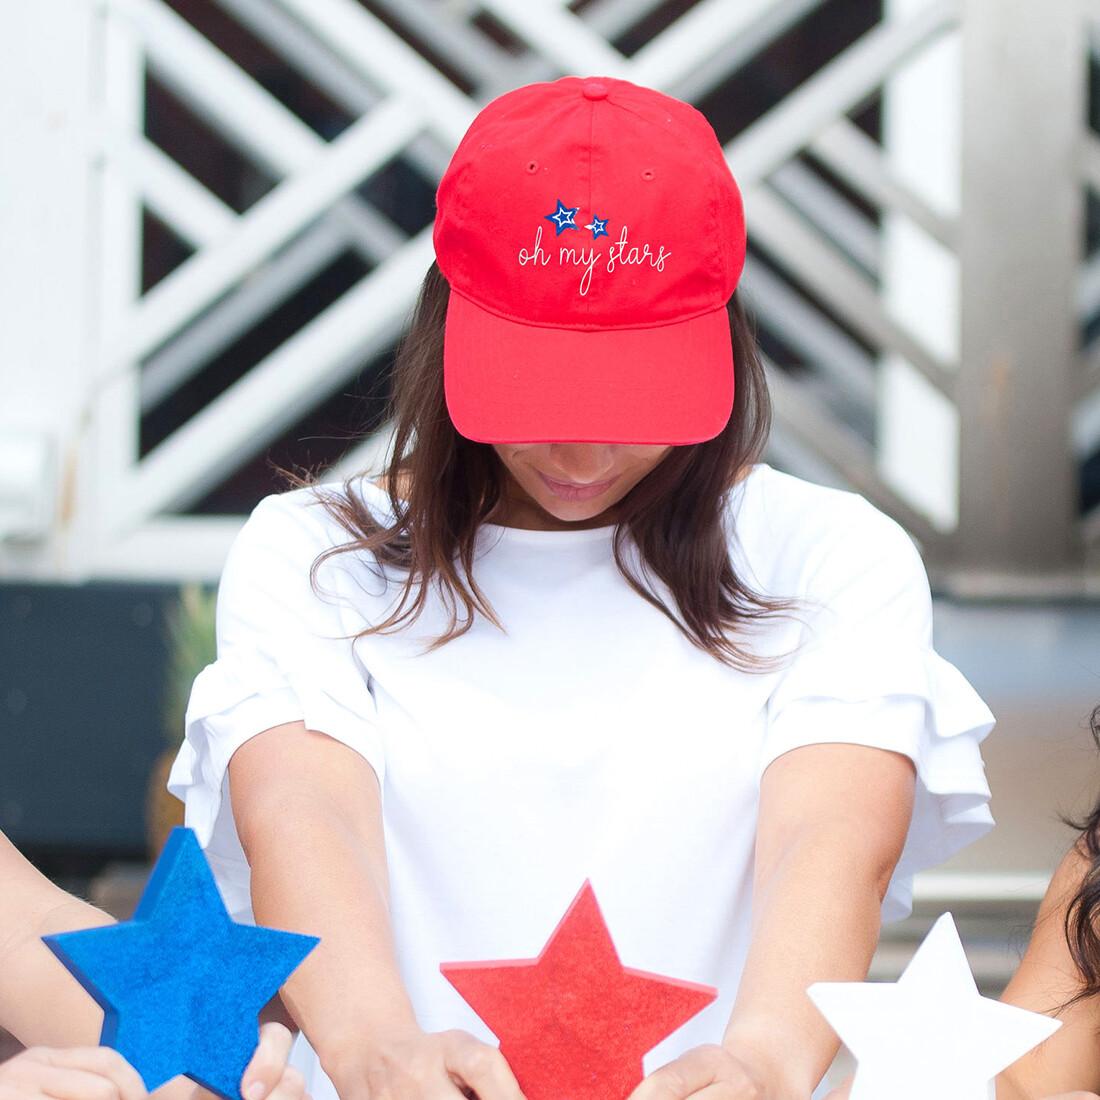 Oh My Stars Red Cap